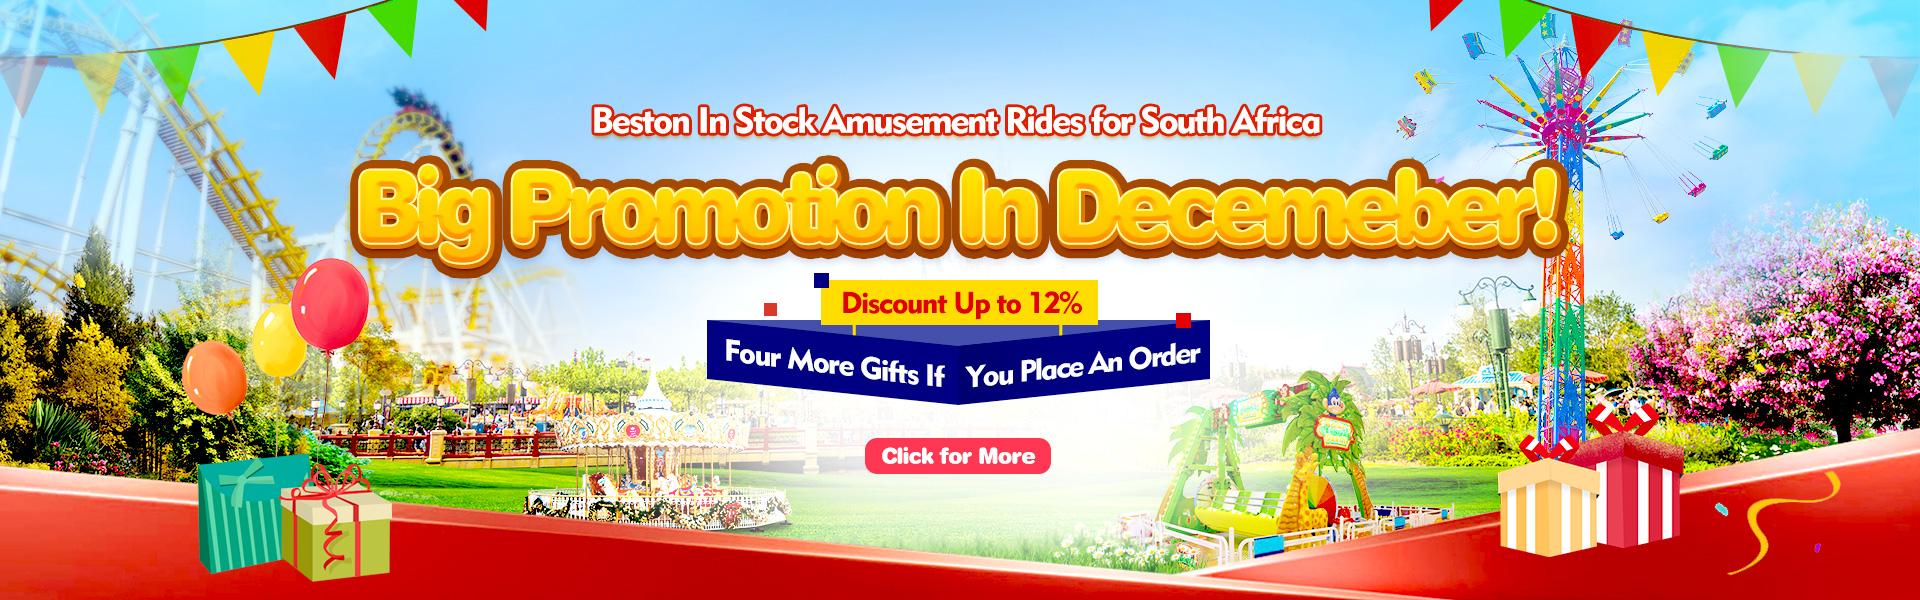 Beston New Amusement Rides In Stock